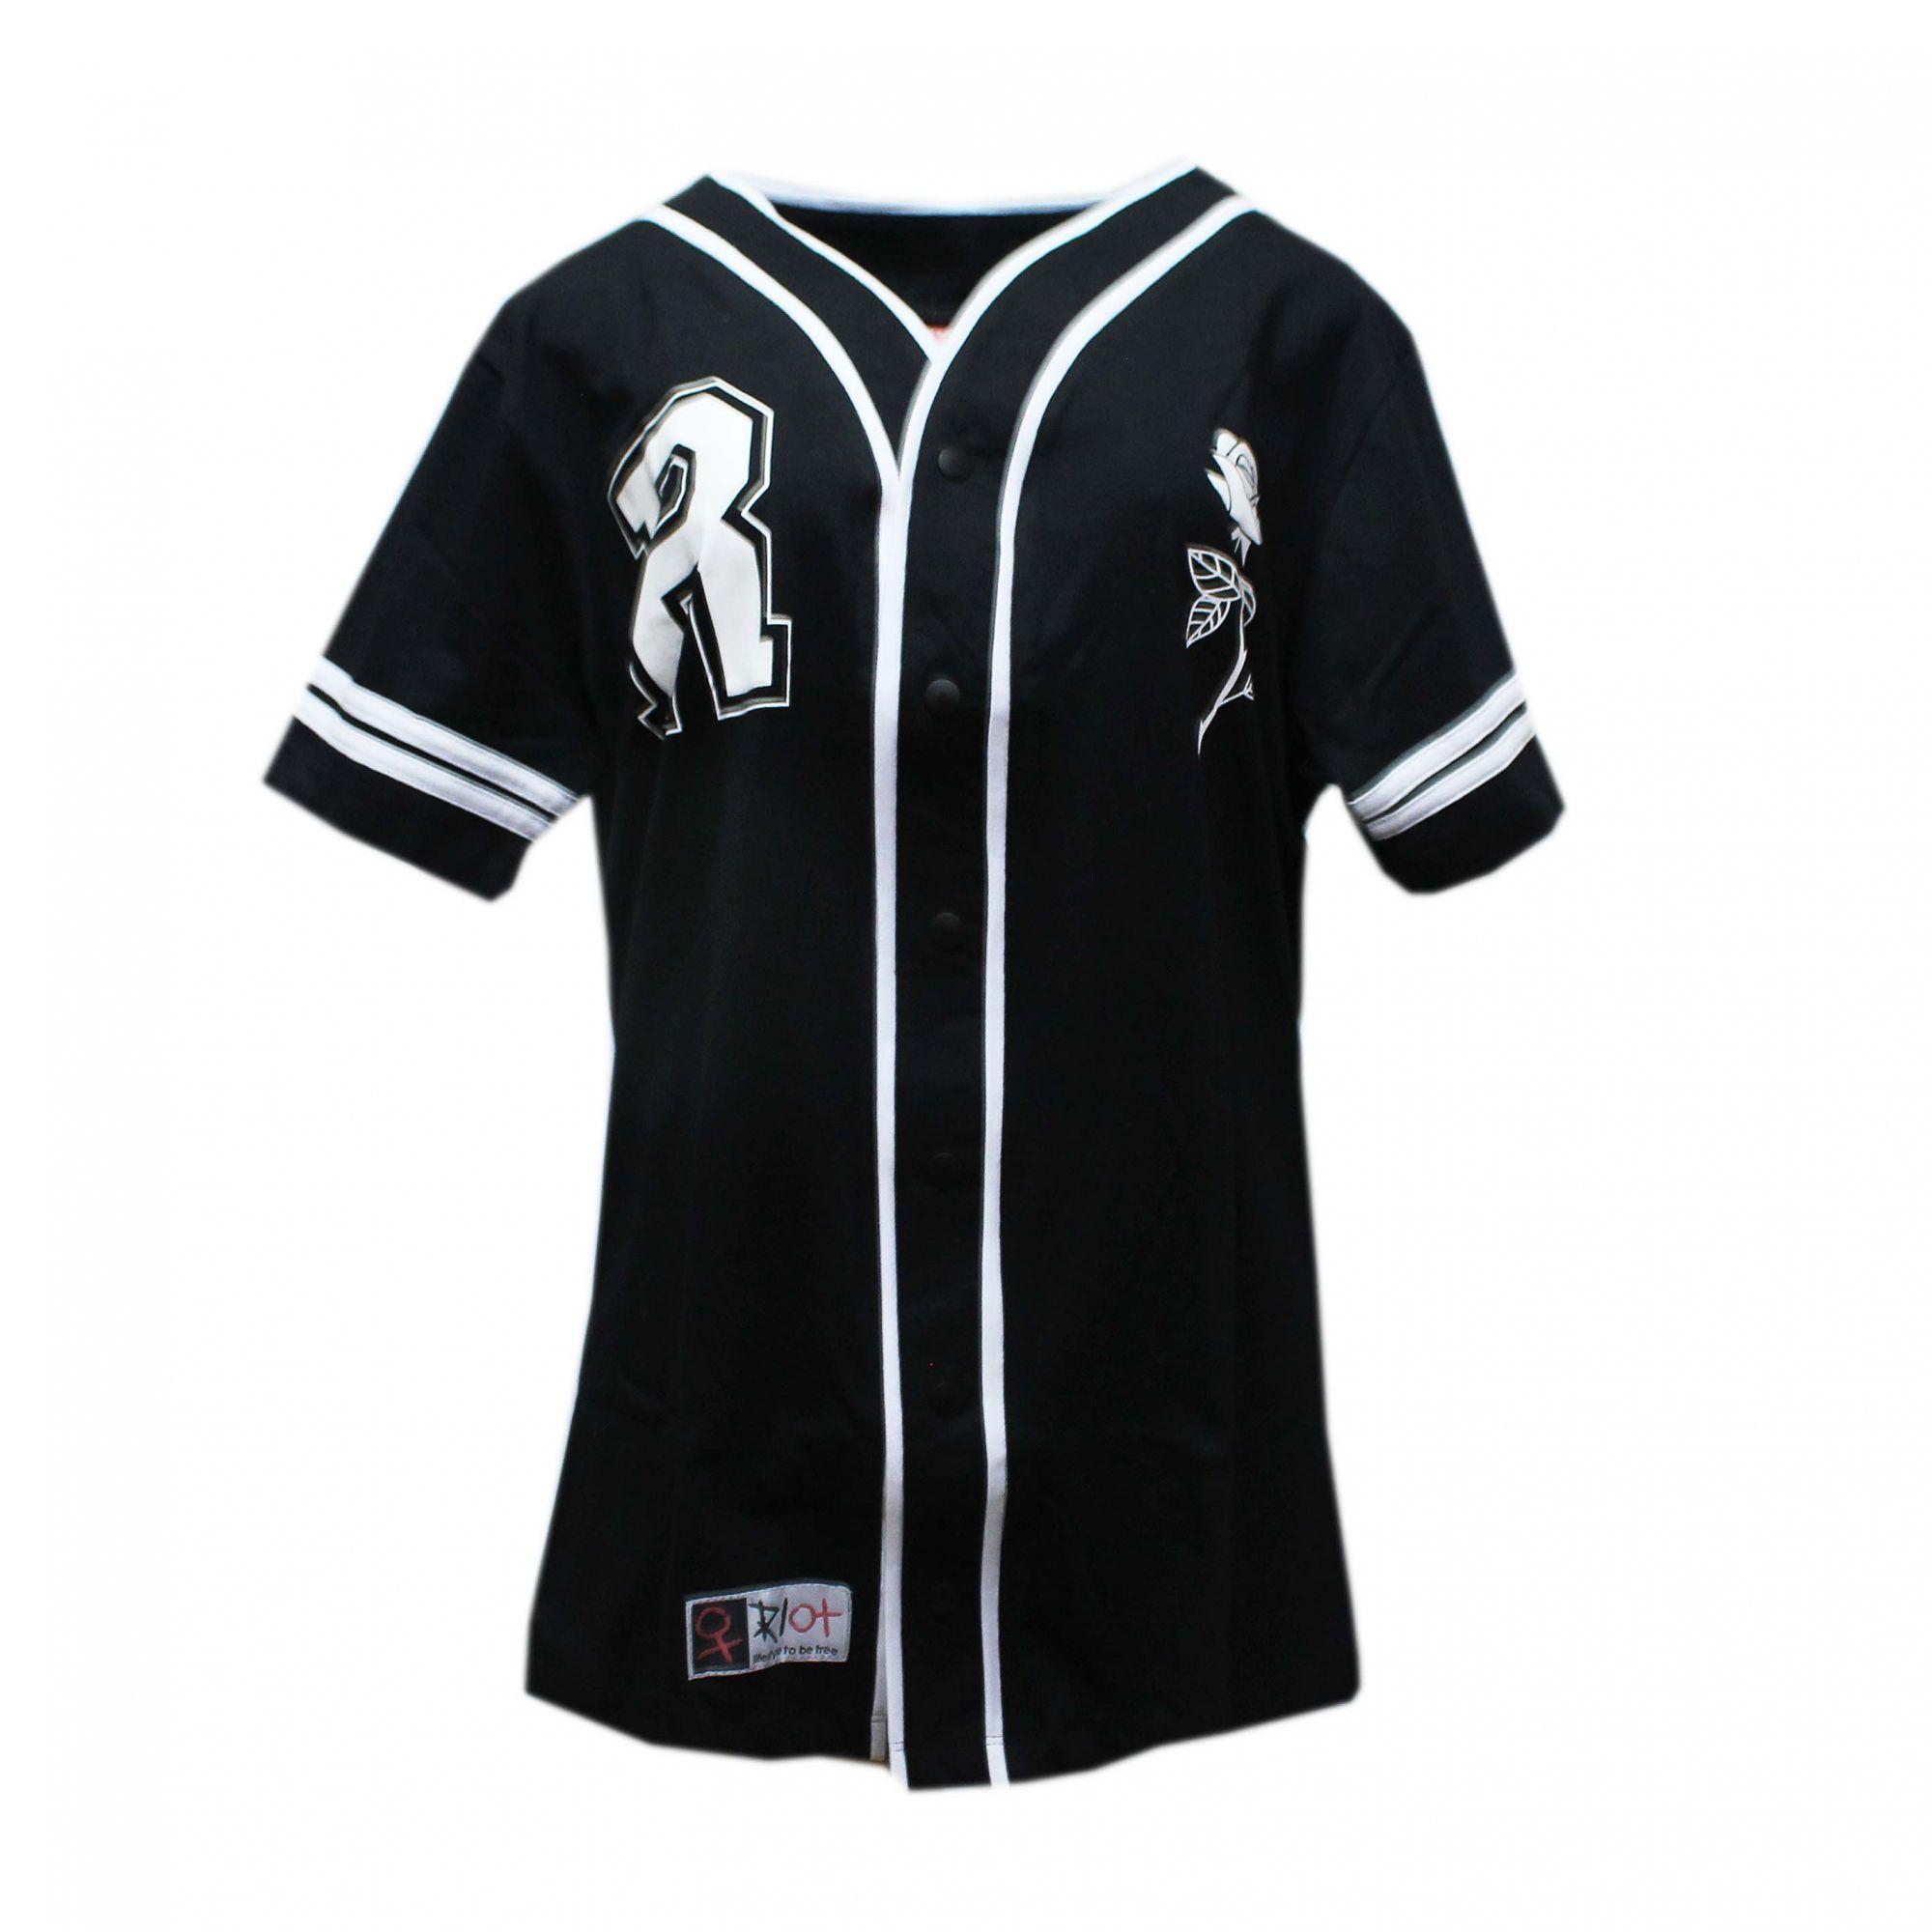 Camiseta Riot Baseball Passion Preto